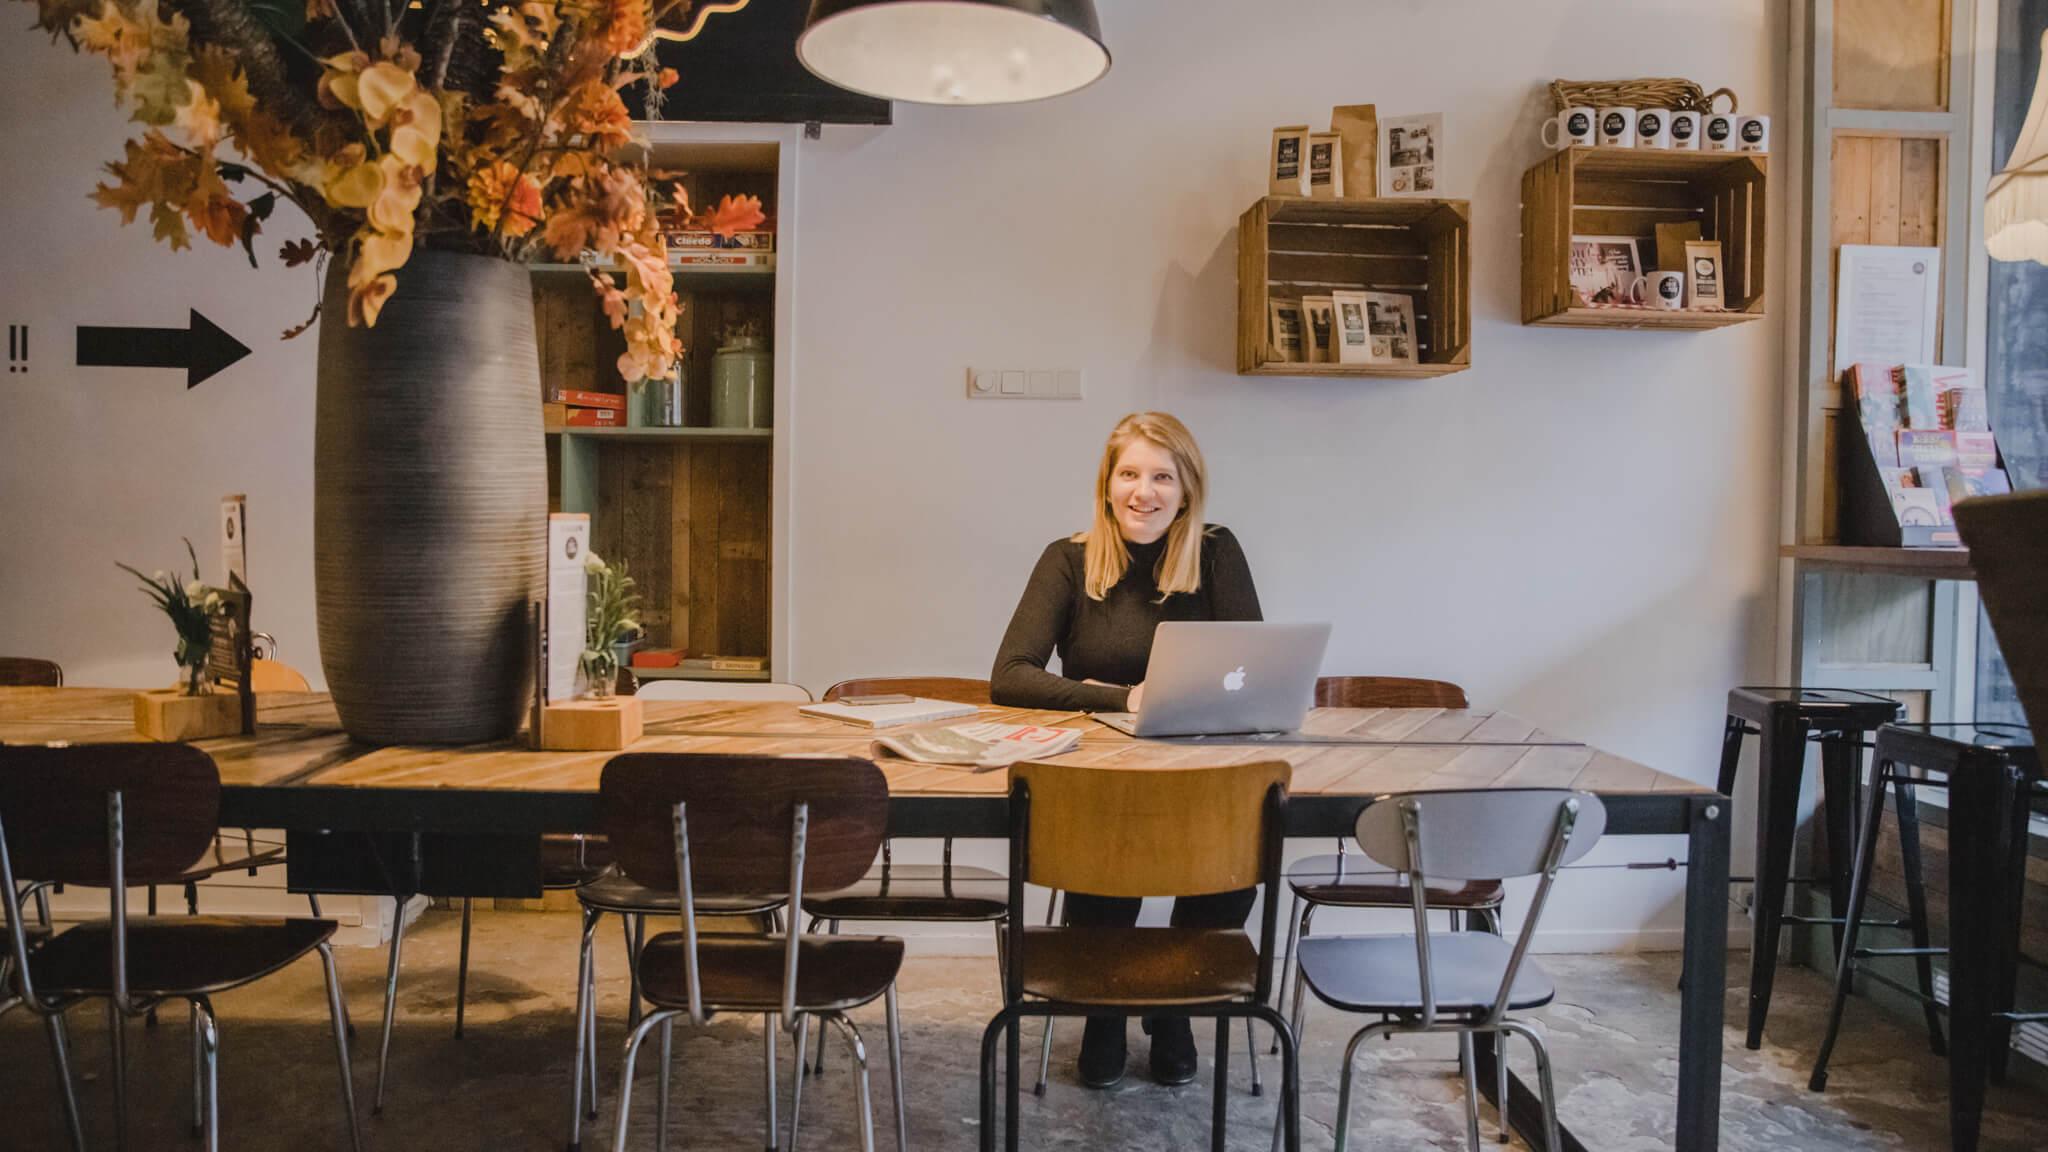 SEO-coach voor ondernemers Gabriella van Rosmalen